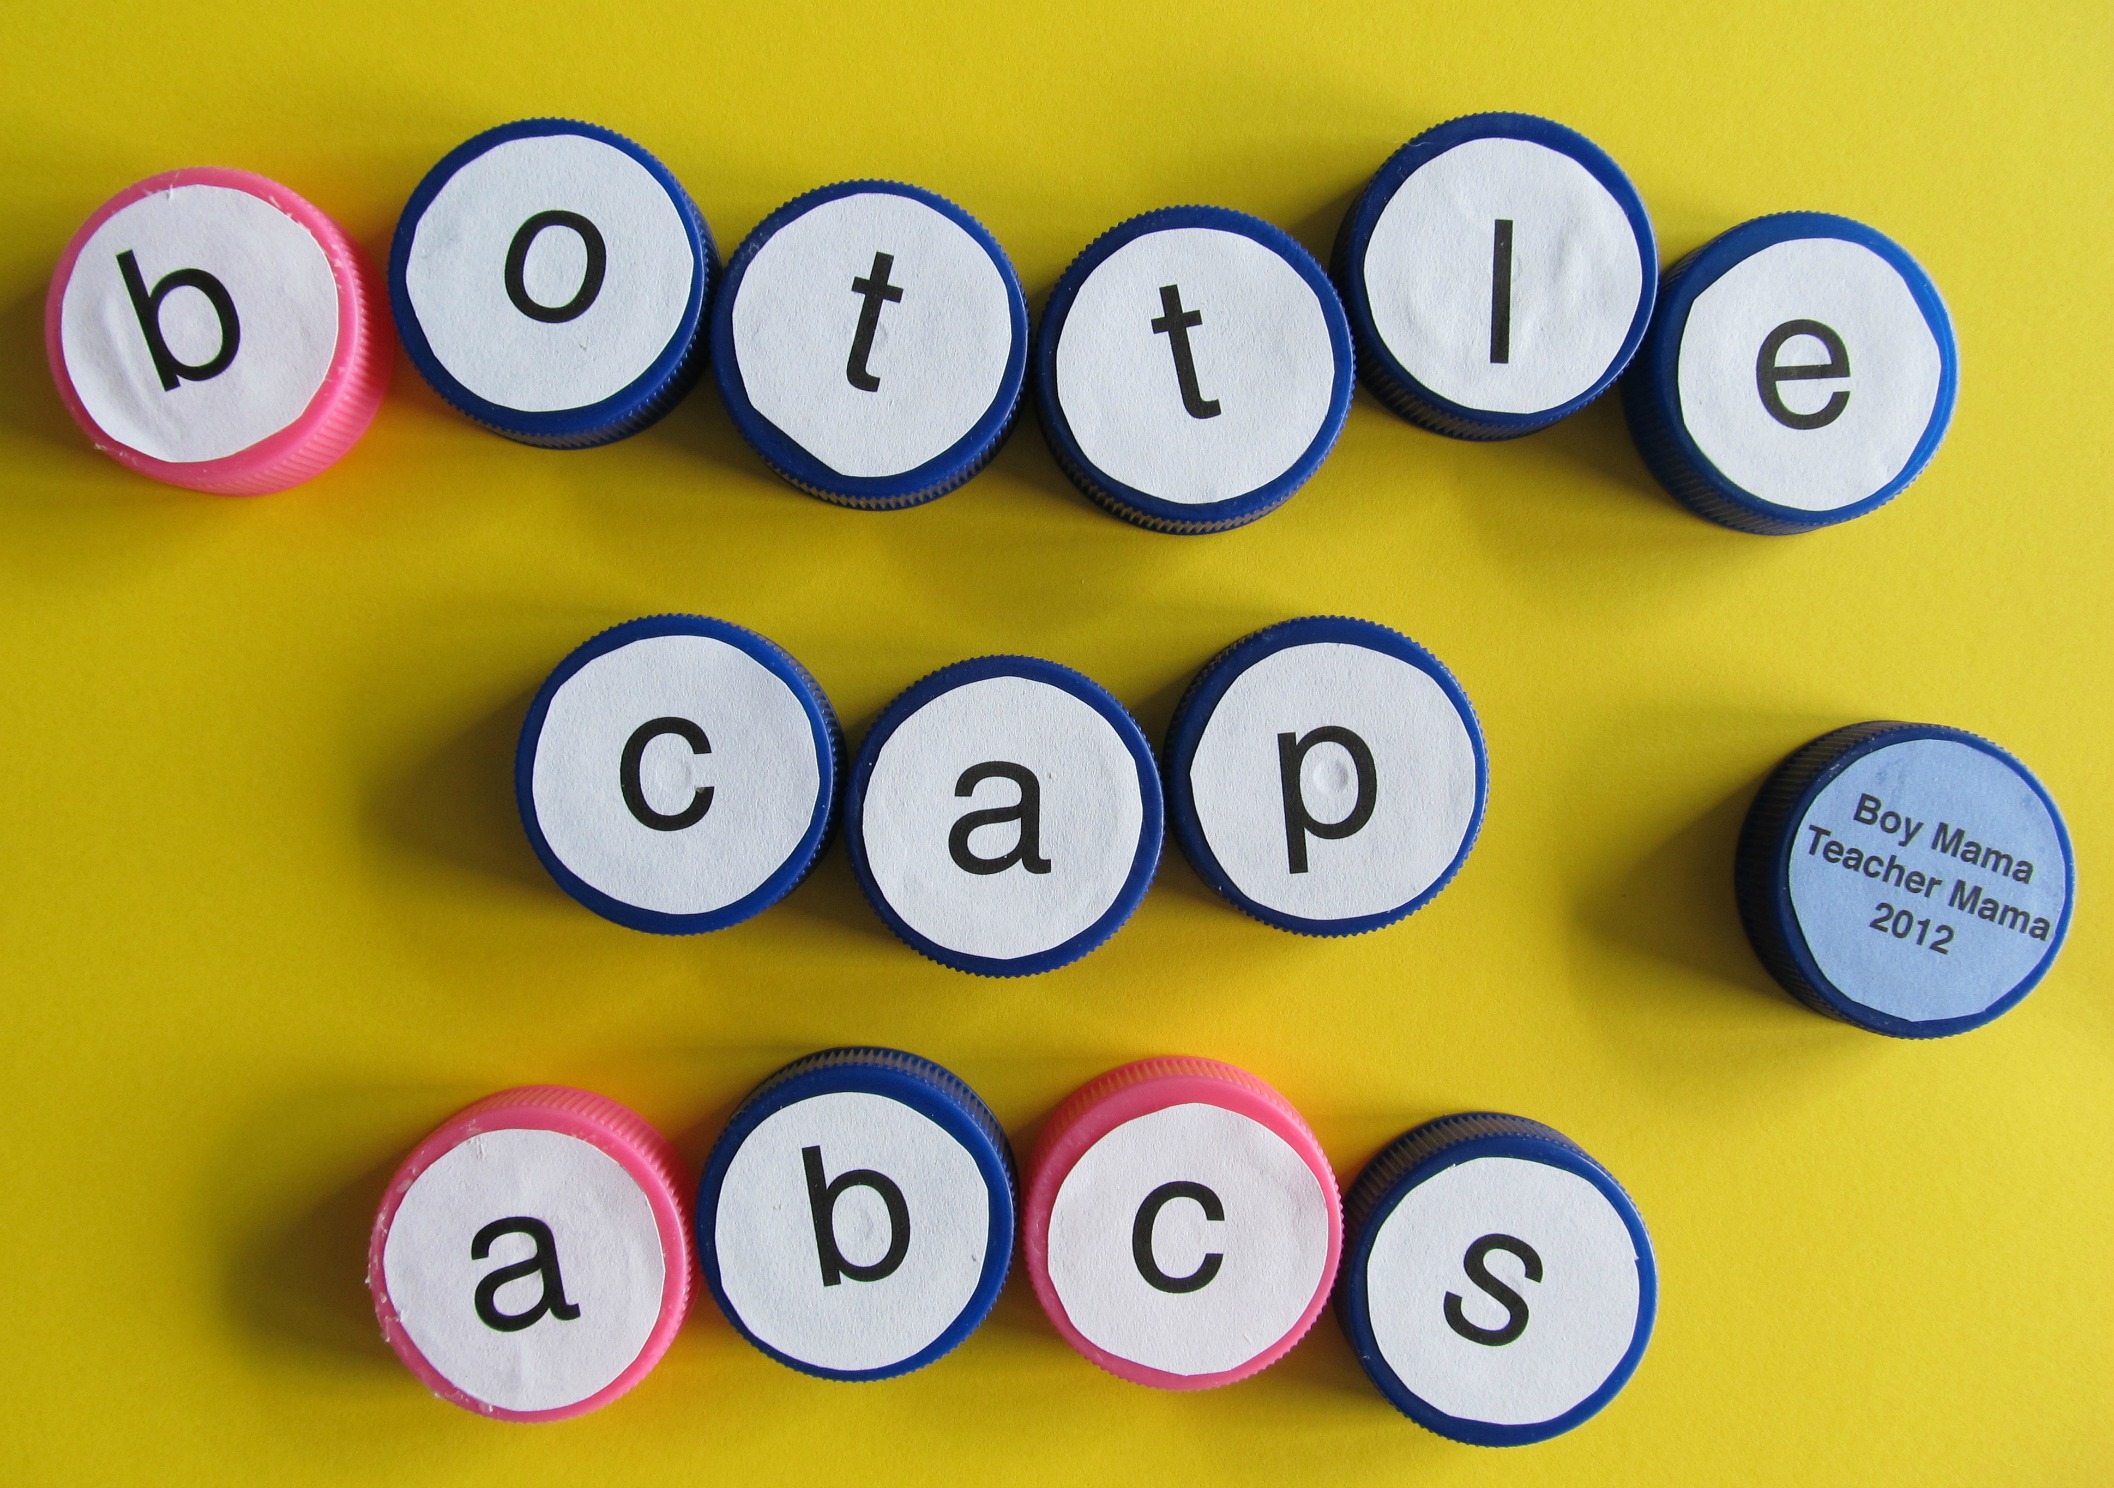 teacher mama  bottle caps abcs